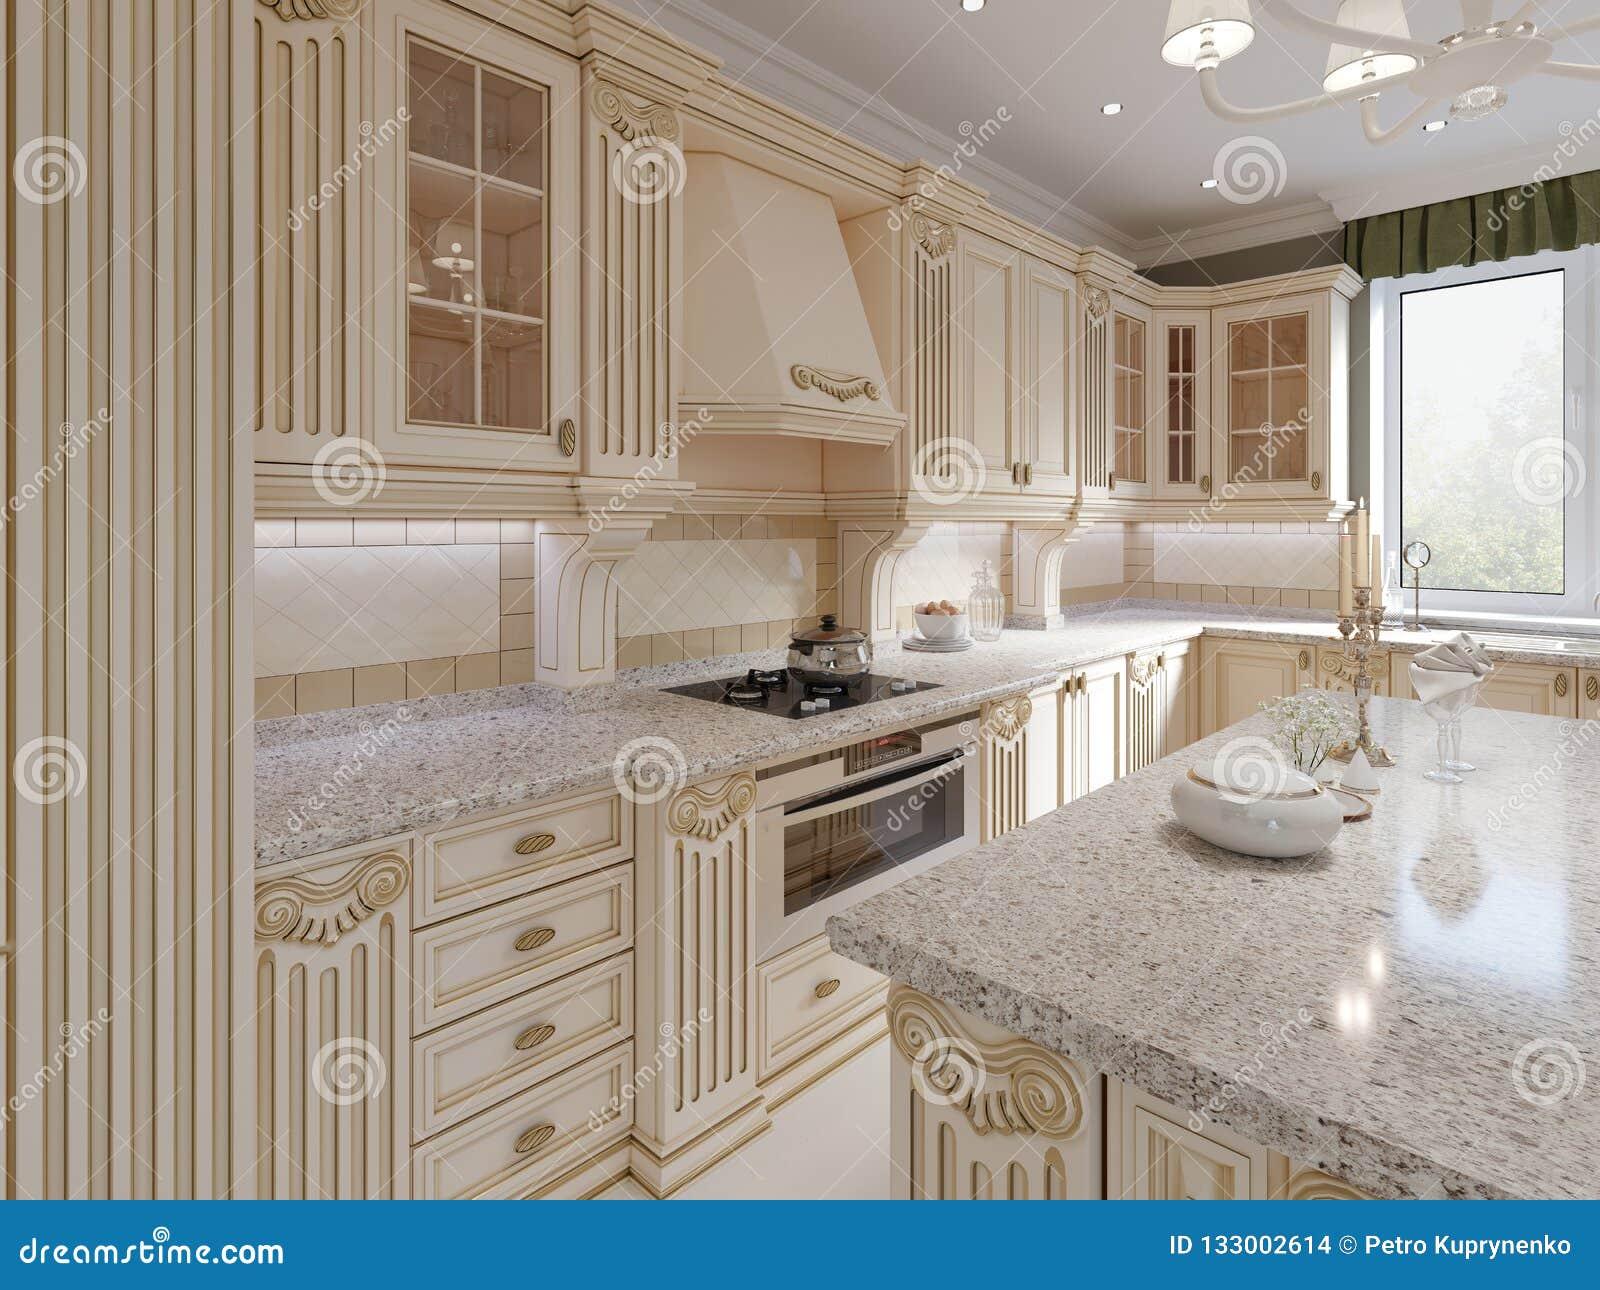 classical wooden kitchen with wooden details beige luxury